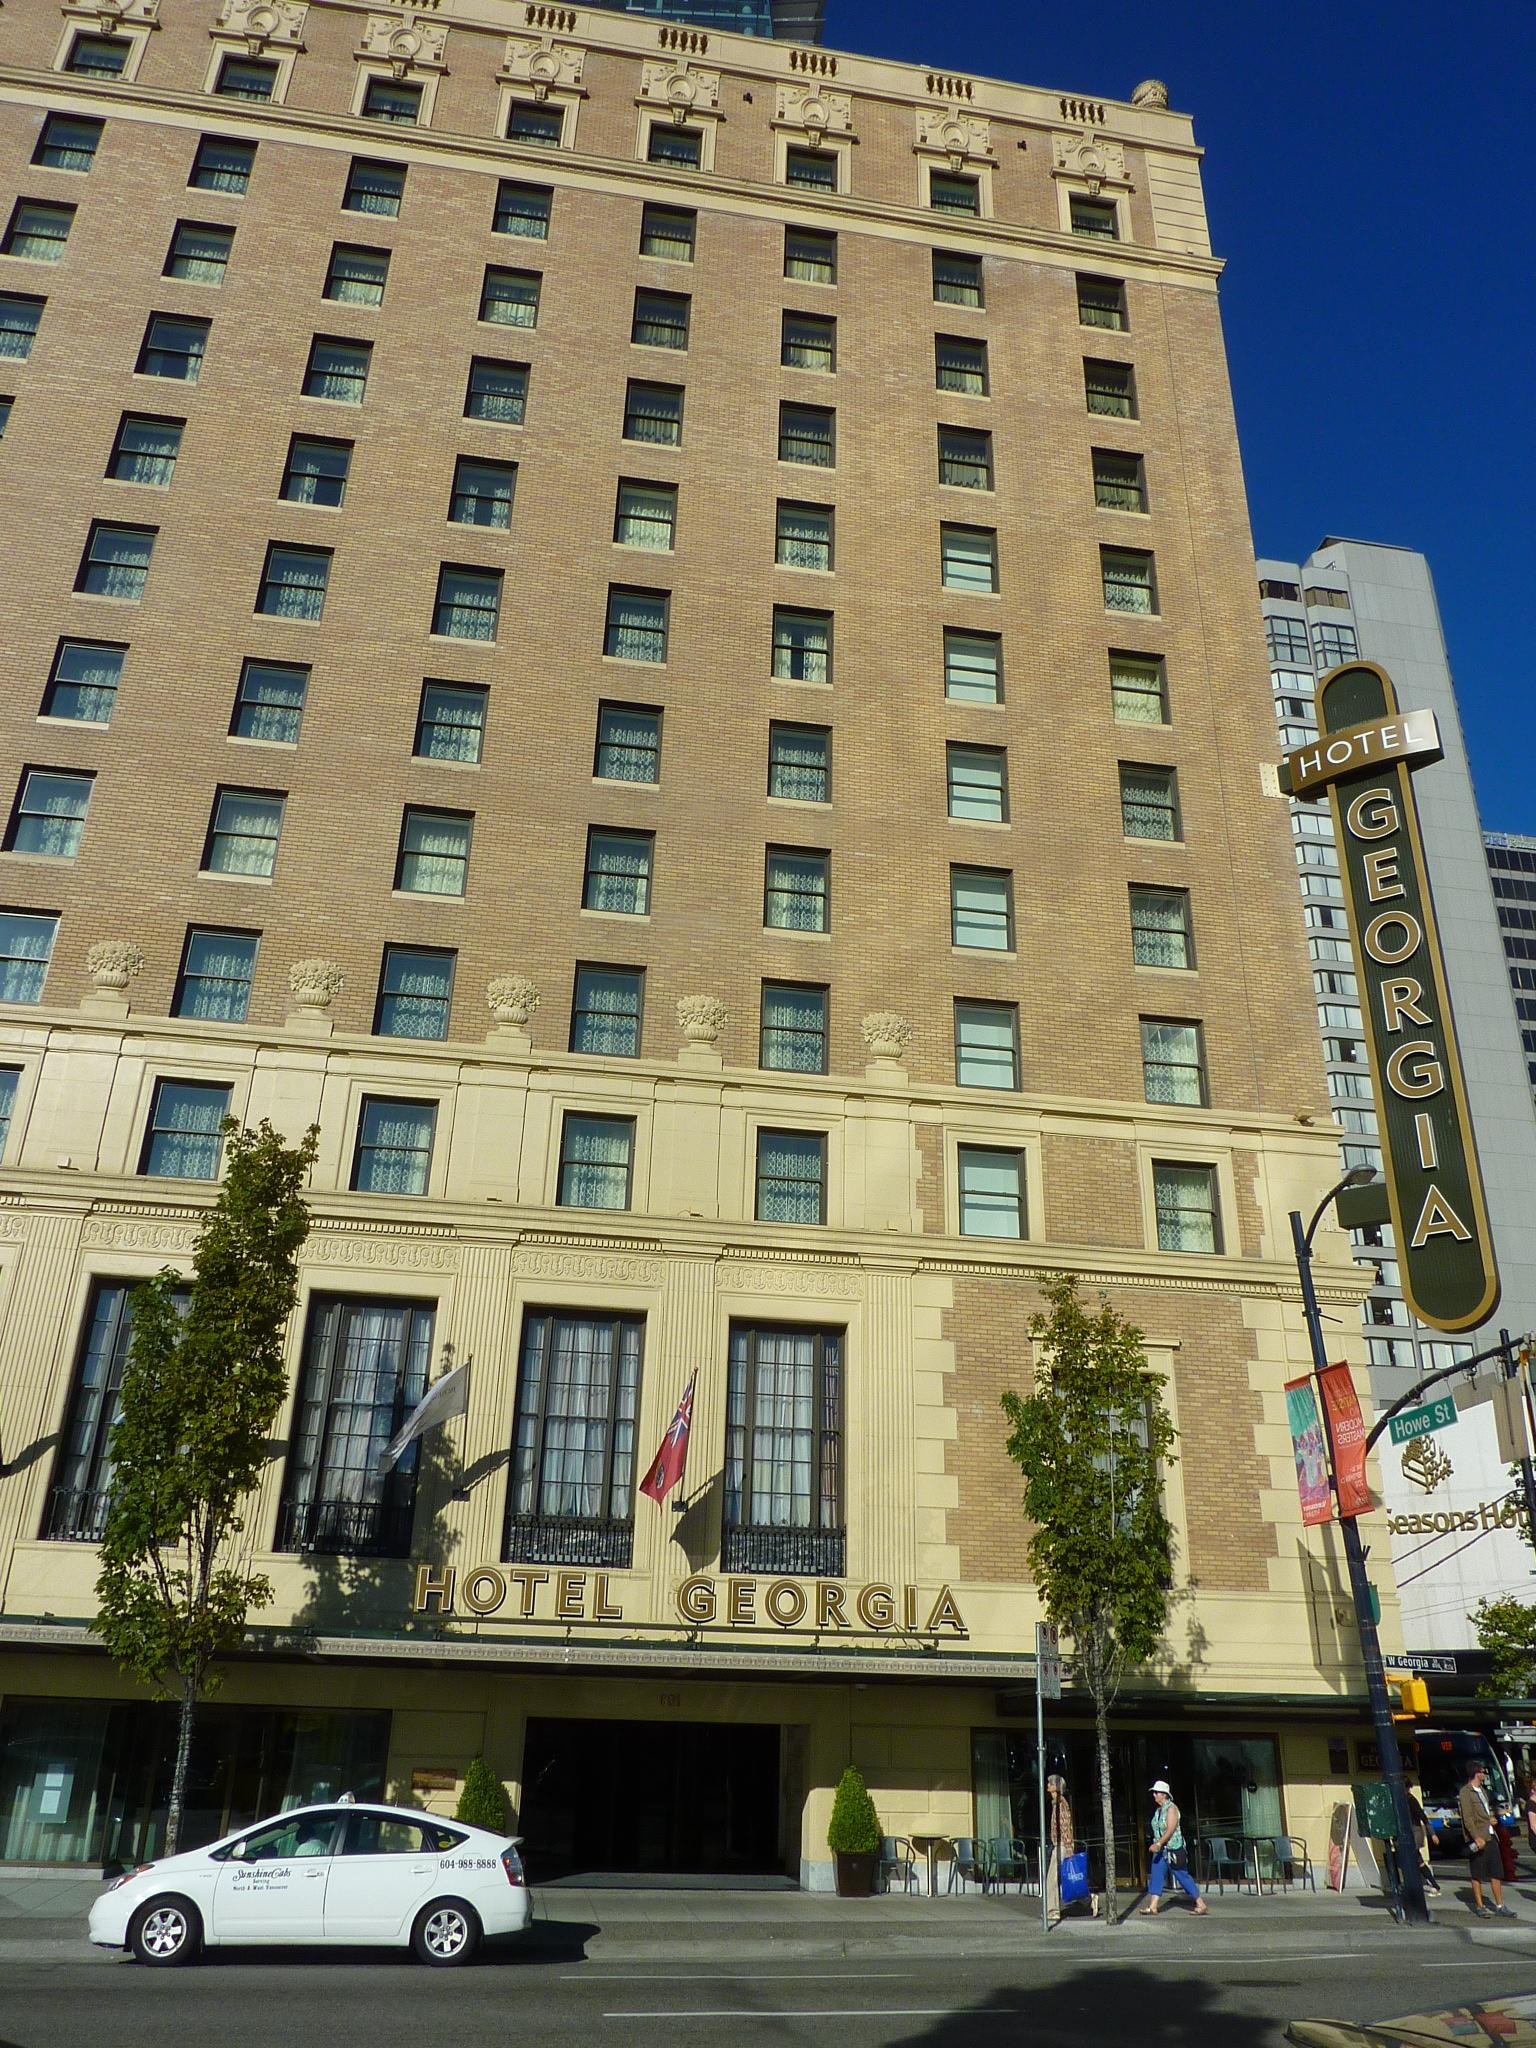 Georgia Hotel Vancouver Spa